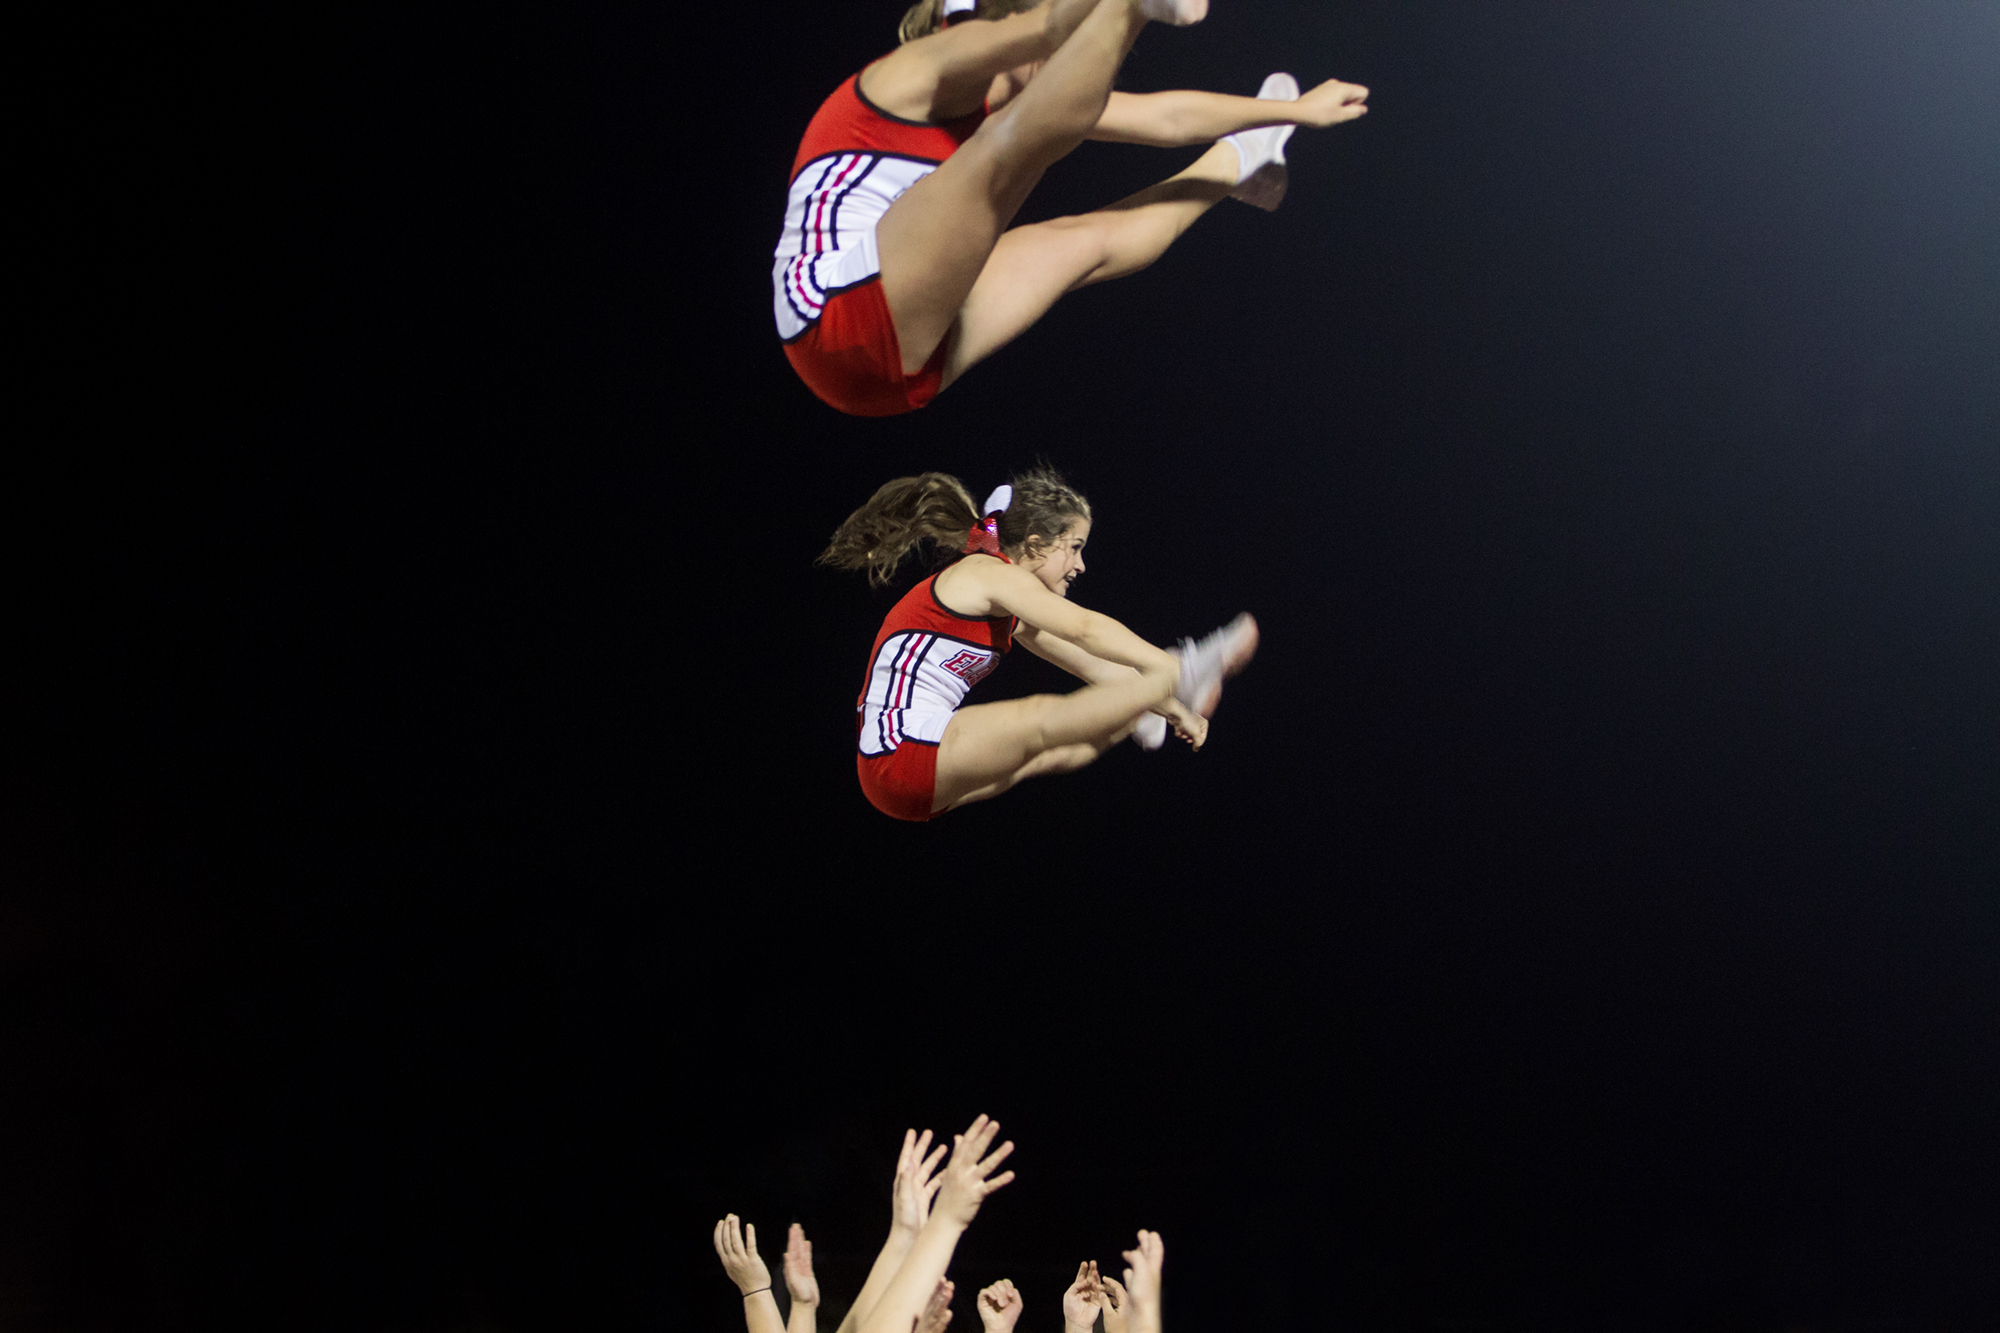 cheer-1small.jpg